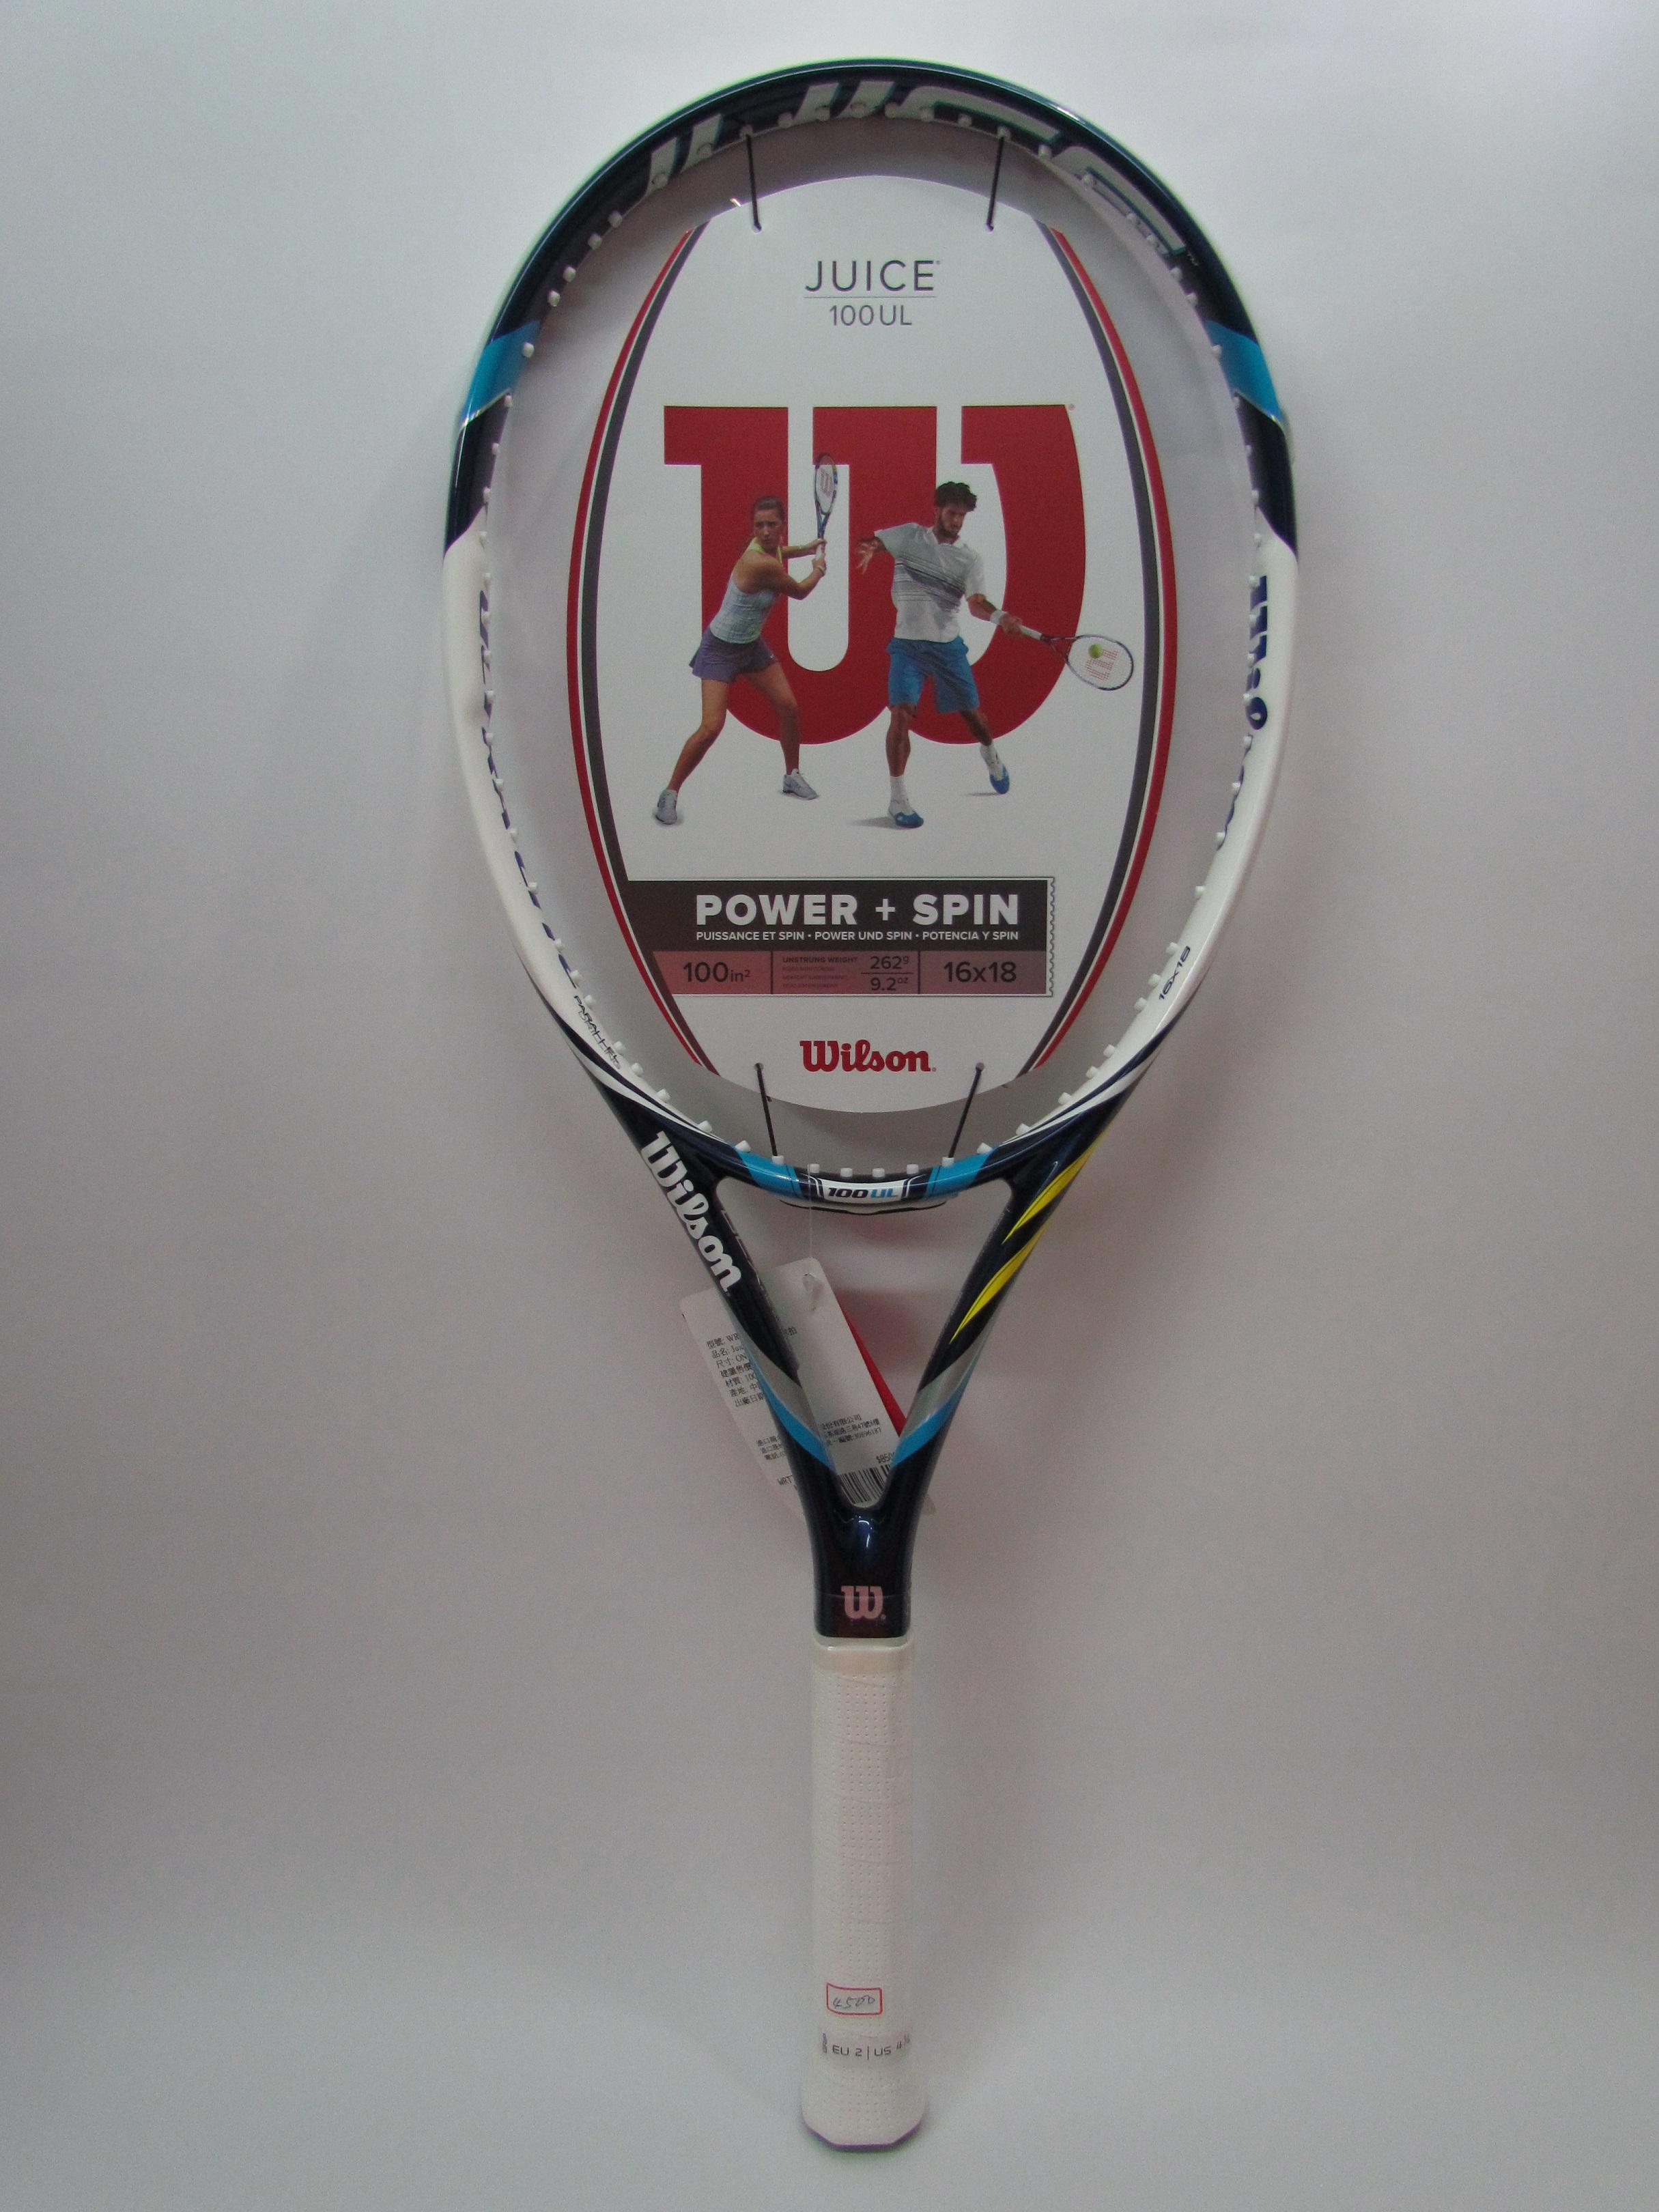 Wilson專業網球拍 Azarenka款 Juice 100UL